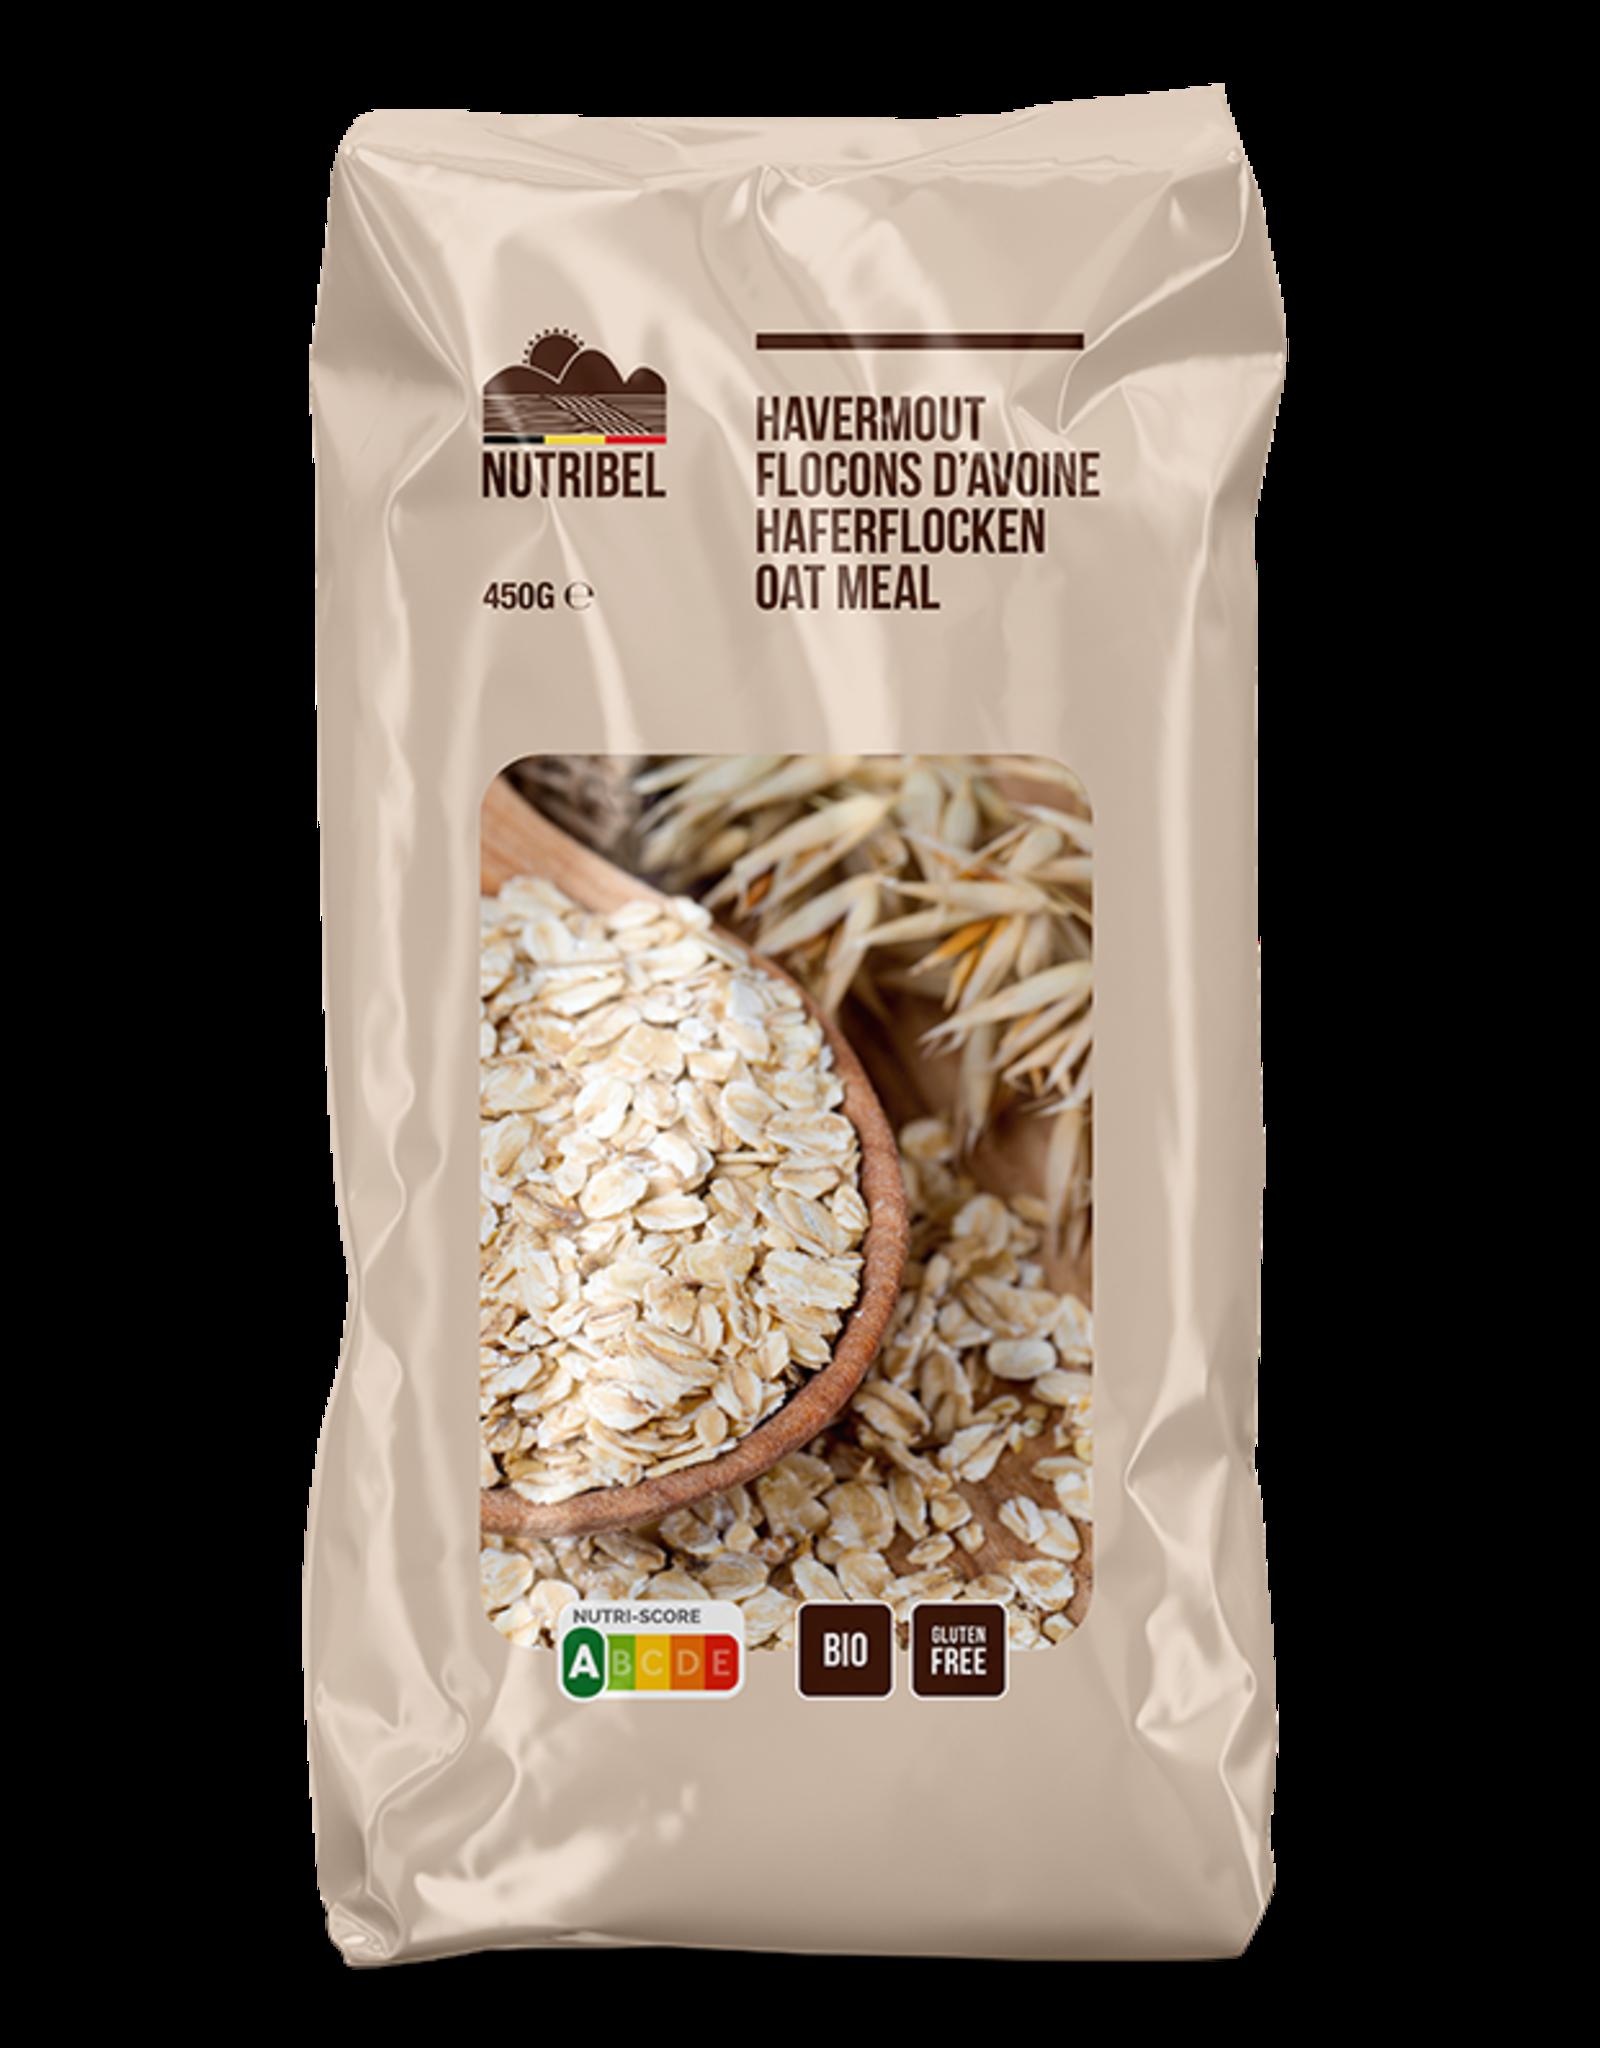 Nutribel Havermout bio & glutenvrij 450g